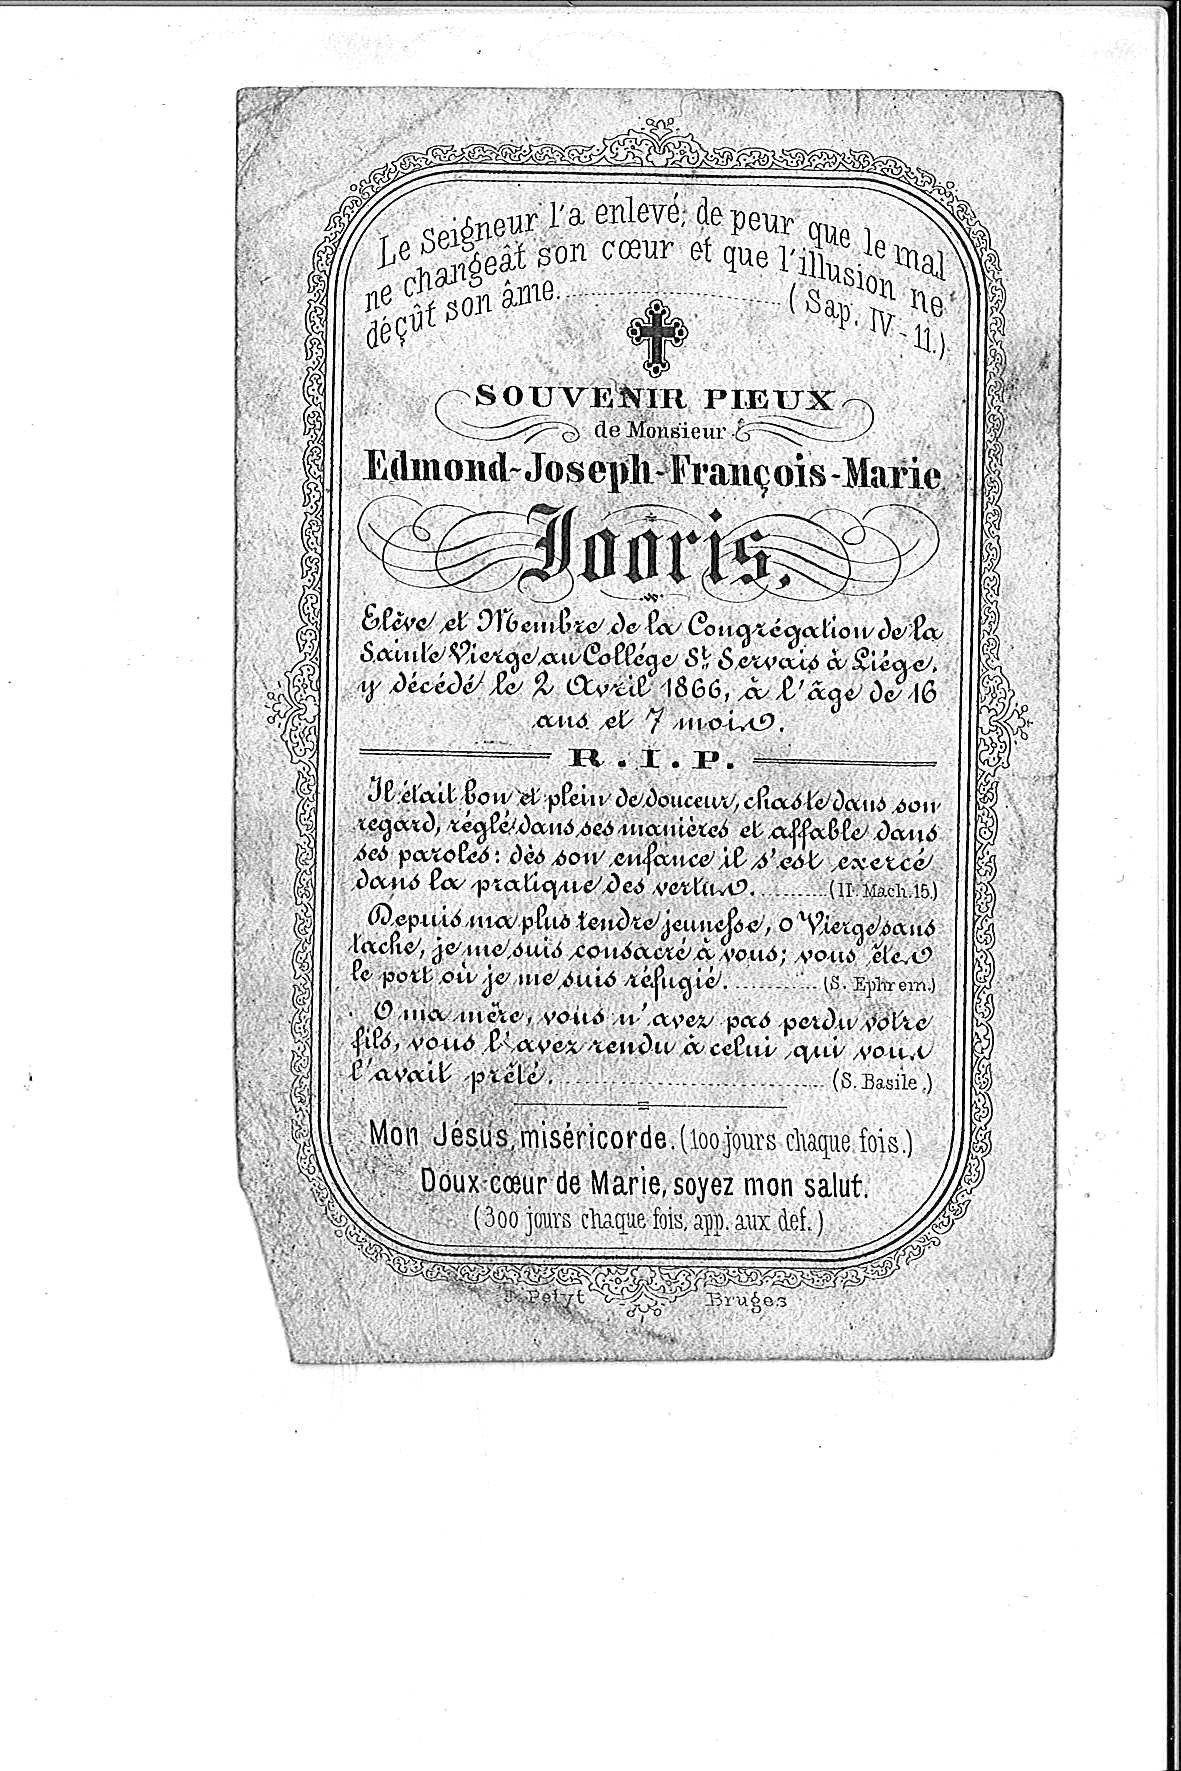 Edmond-Joseph-François-Marie(1866)20151019094231_00054.jpg